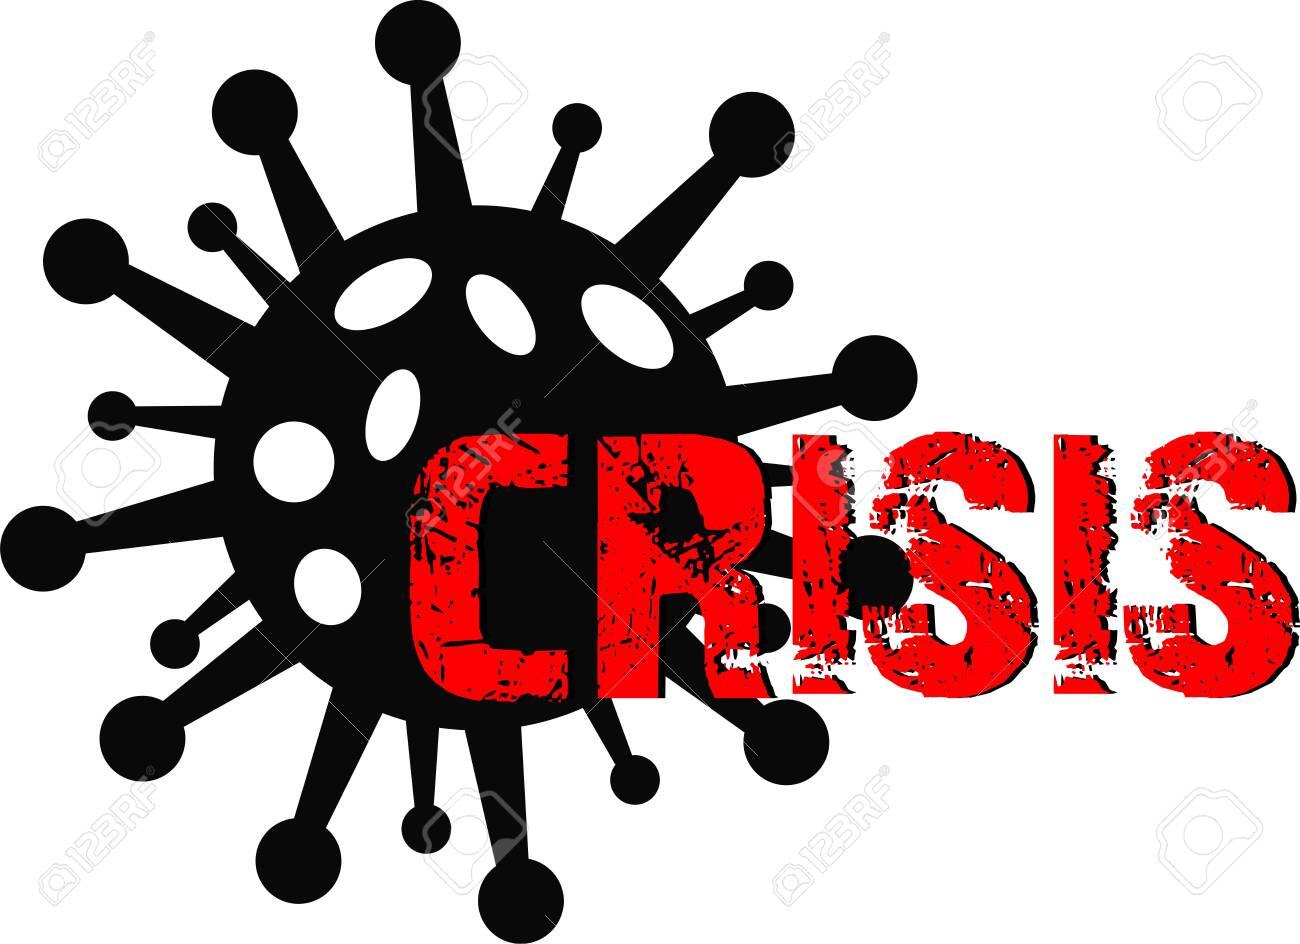 Coronavirus and crisis graphic icon symbol - 148416612